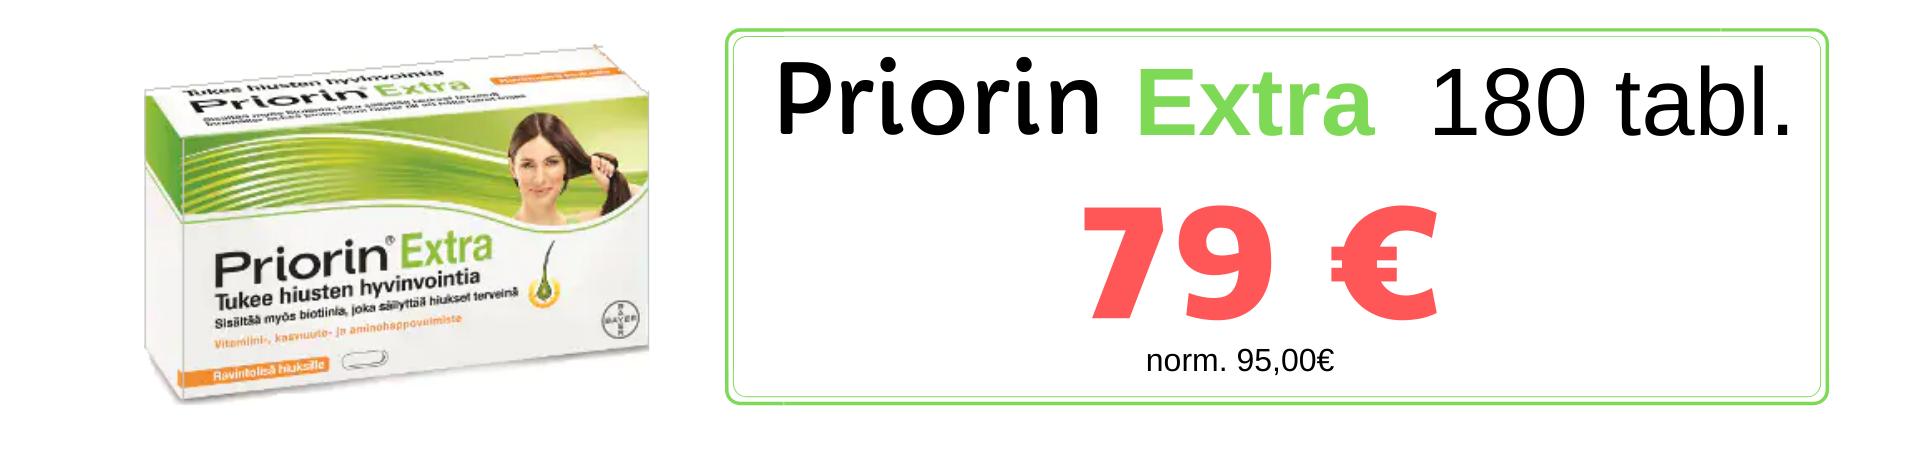 Priorin Extra 180 tabl tarjous 79€